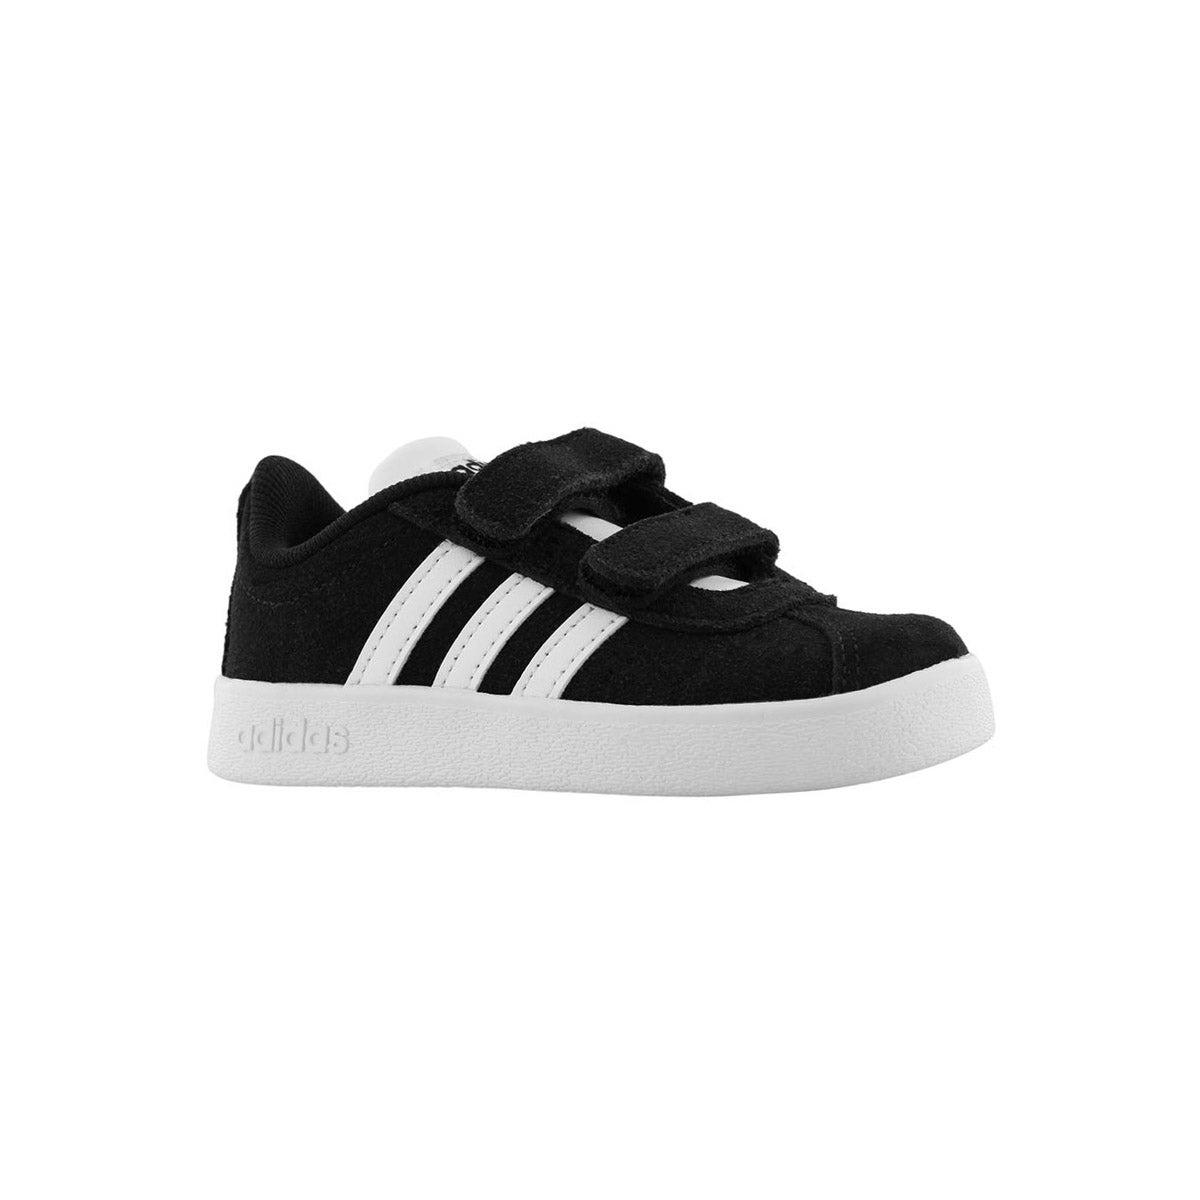 bbfe44e0 Toddlers' VL COURT 2.0 CMF I black/white sneakers